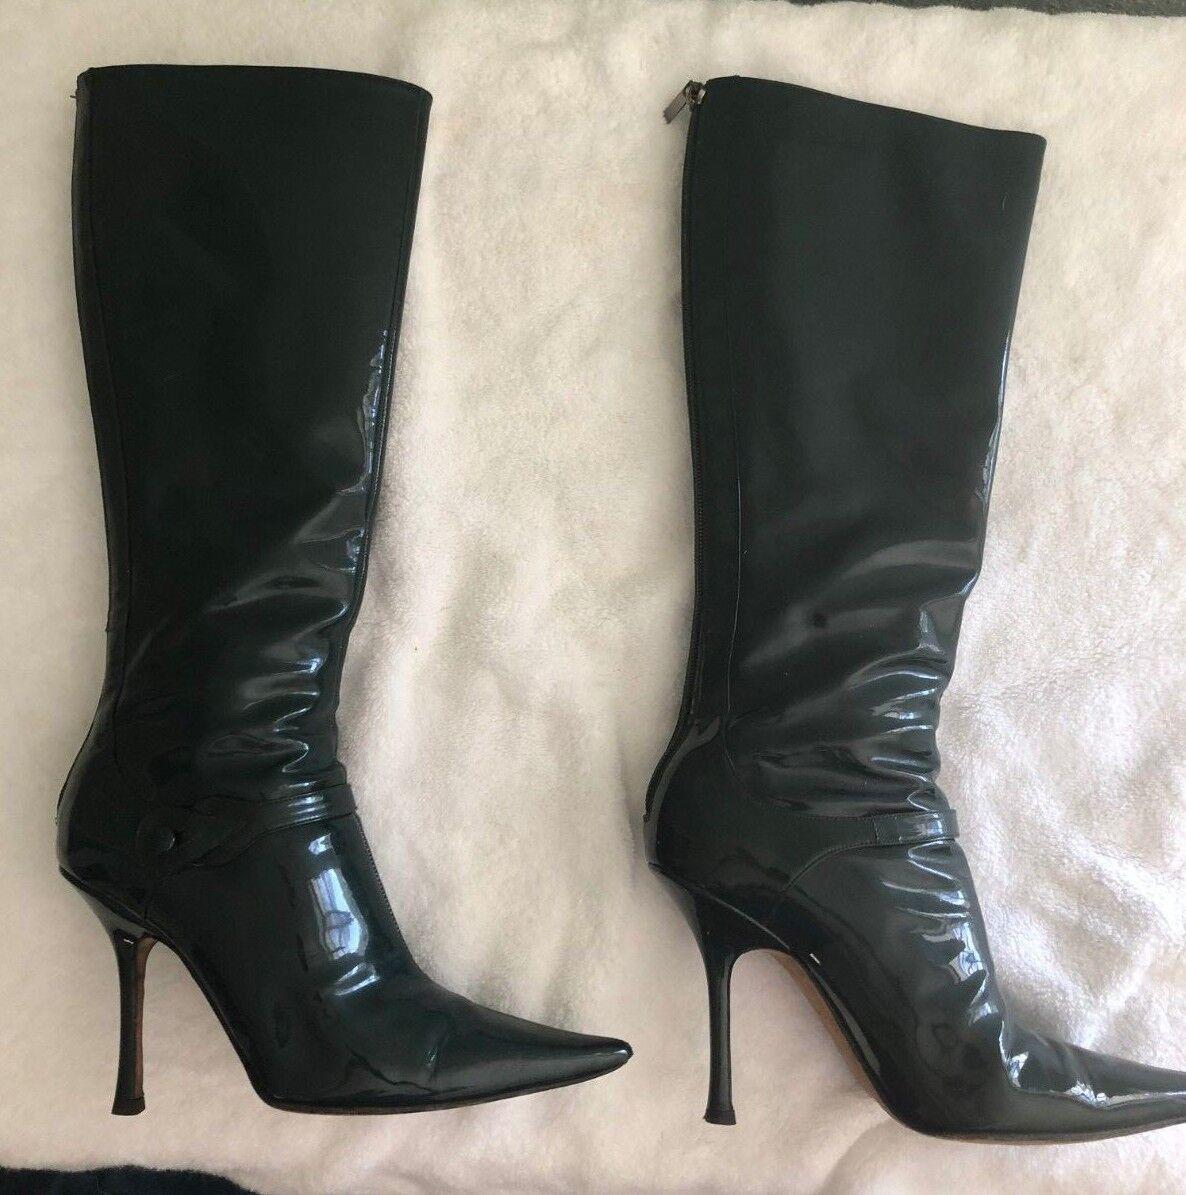 EUC Jimmy Jimmy Jimmy Choo Patent Leather High Stiefel 38.5 (8) EverGrün ab3883